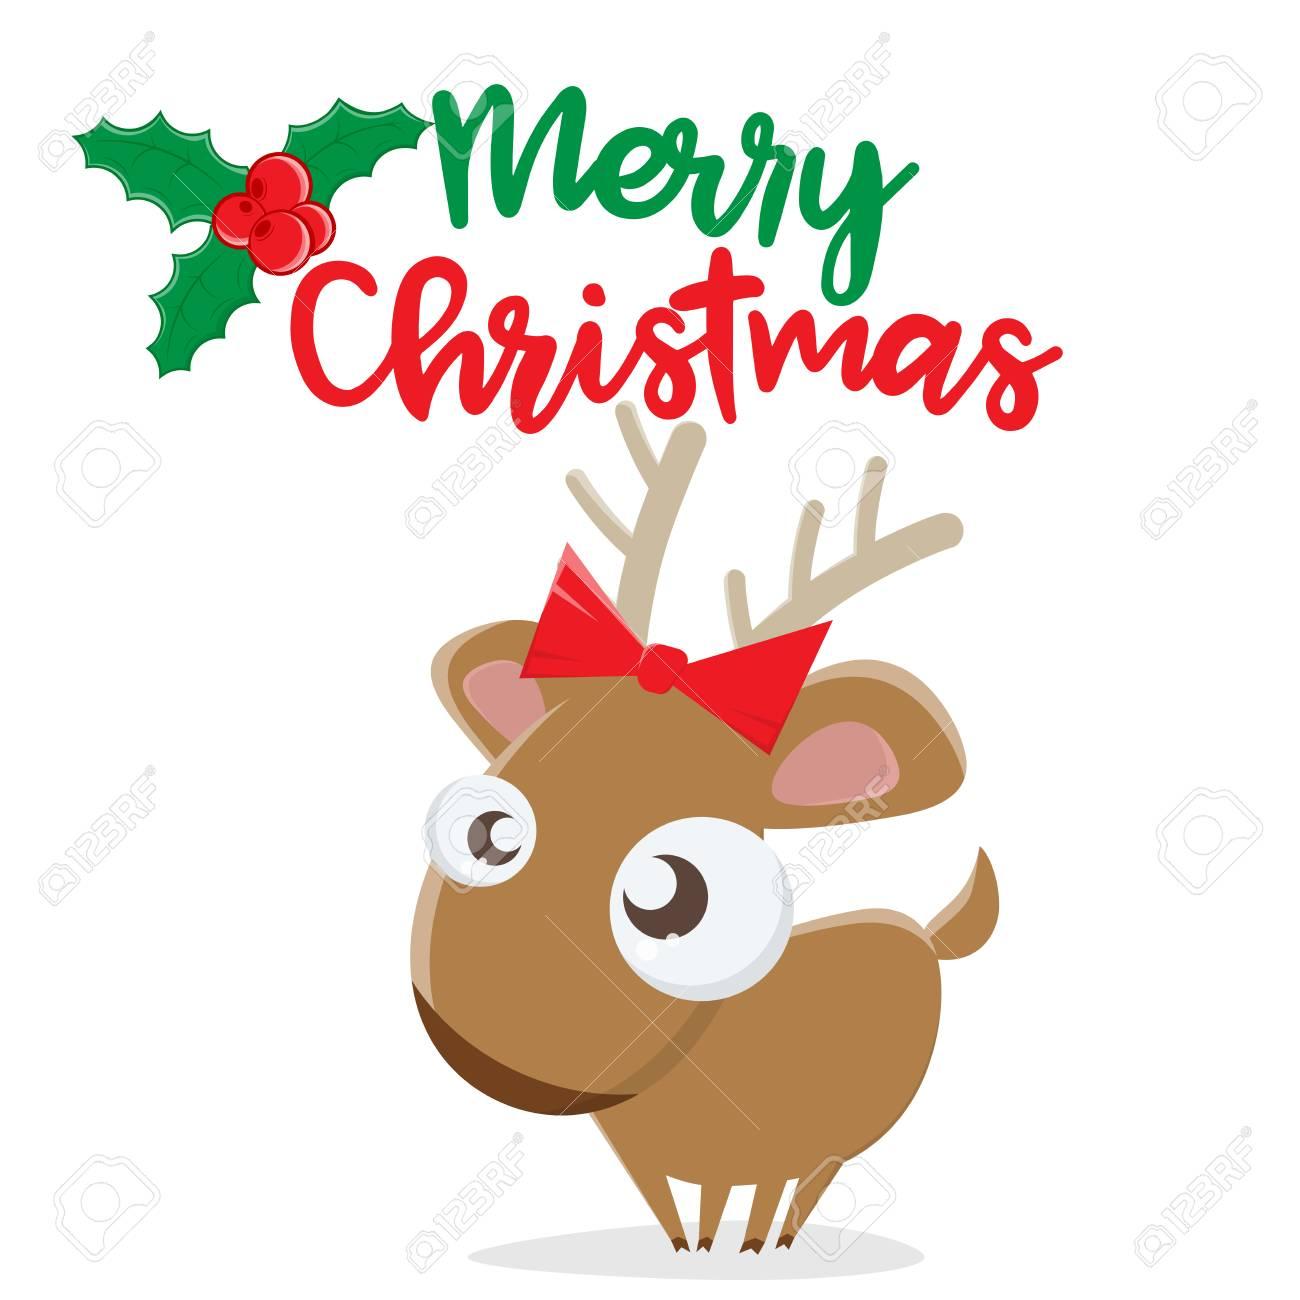 Merry Christmas reindeer clip art vector illustration..